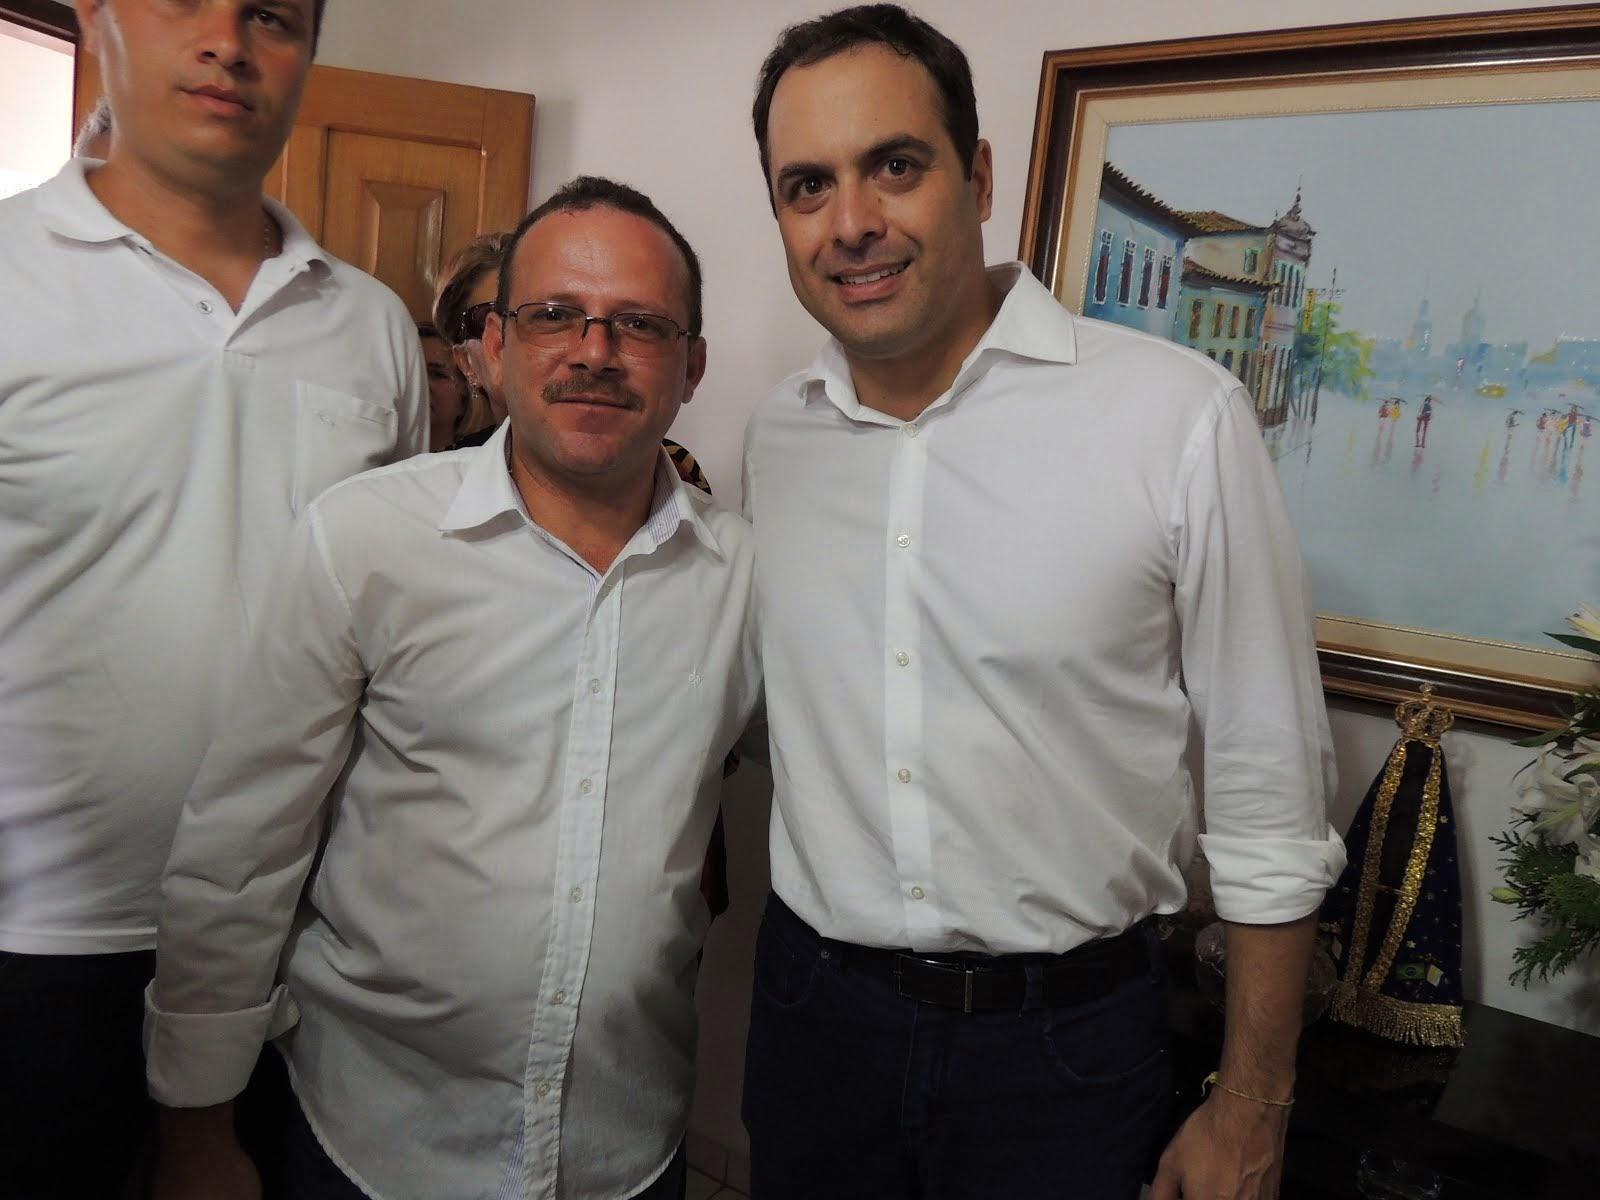 Governador Paulo Câmara & Jornalista Vanderlei Silva Miron.